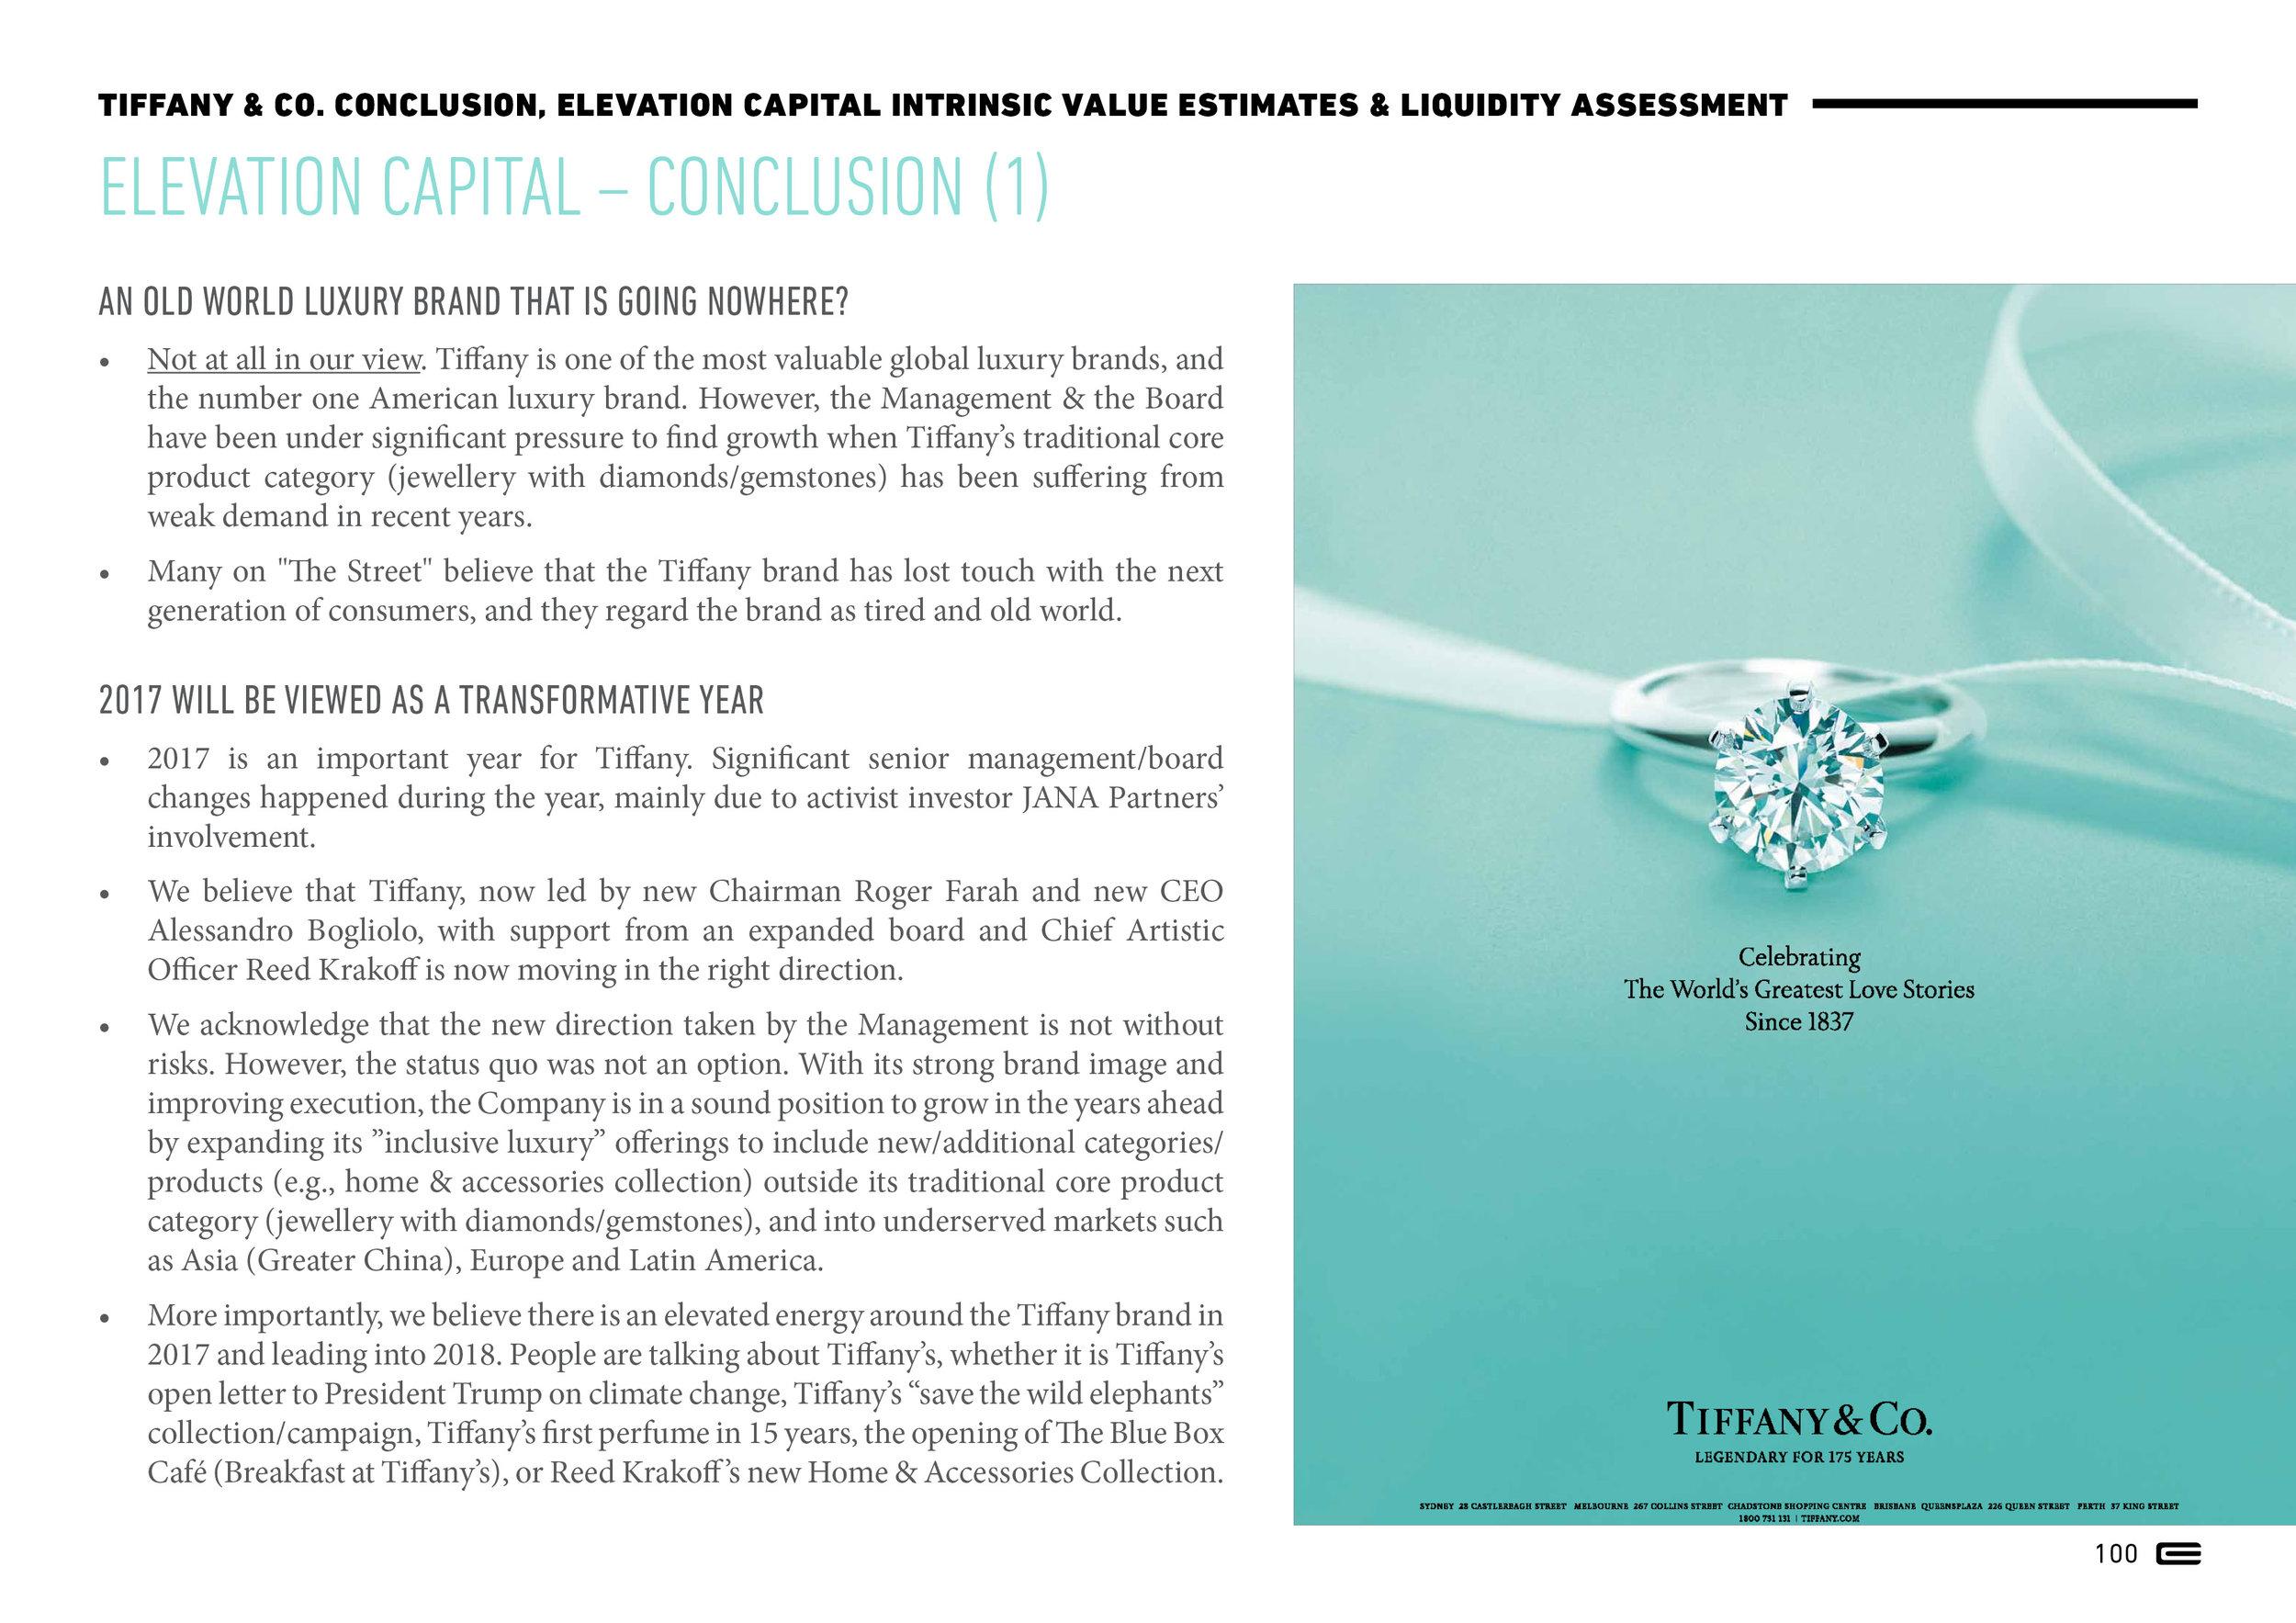 EC - VIC 2018 Presentation on Tiffany100.jpg